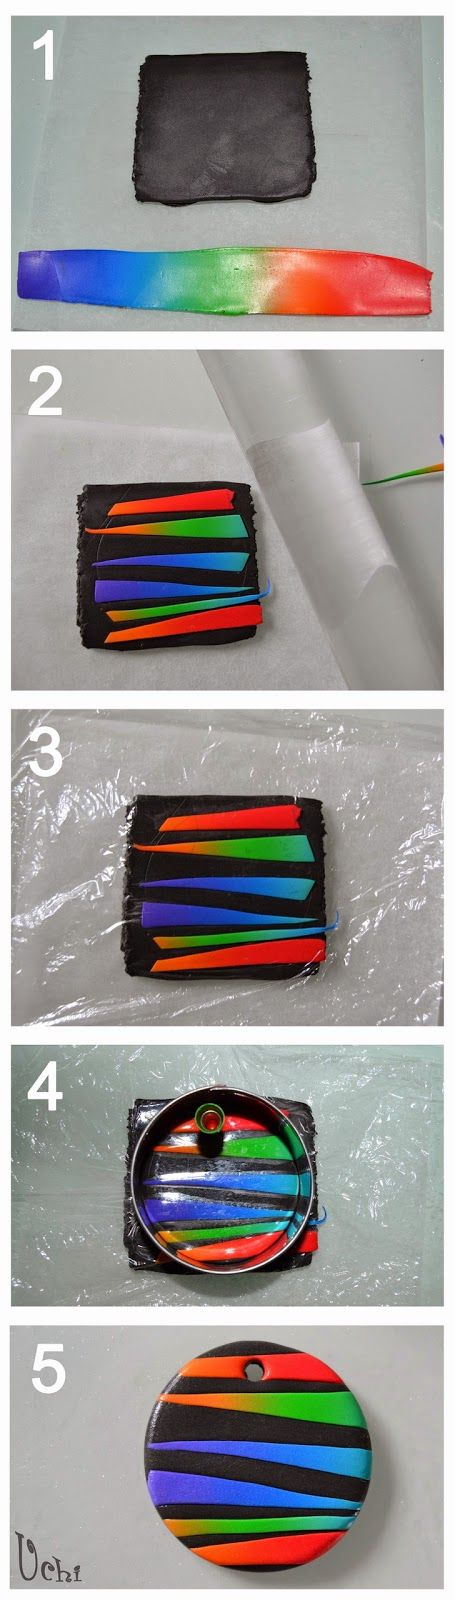 Tutorial colgante arcoíris - Arcilla polimérica, polymer clay   UCHI